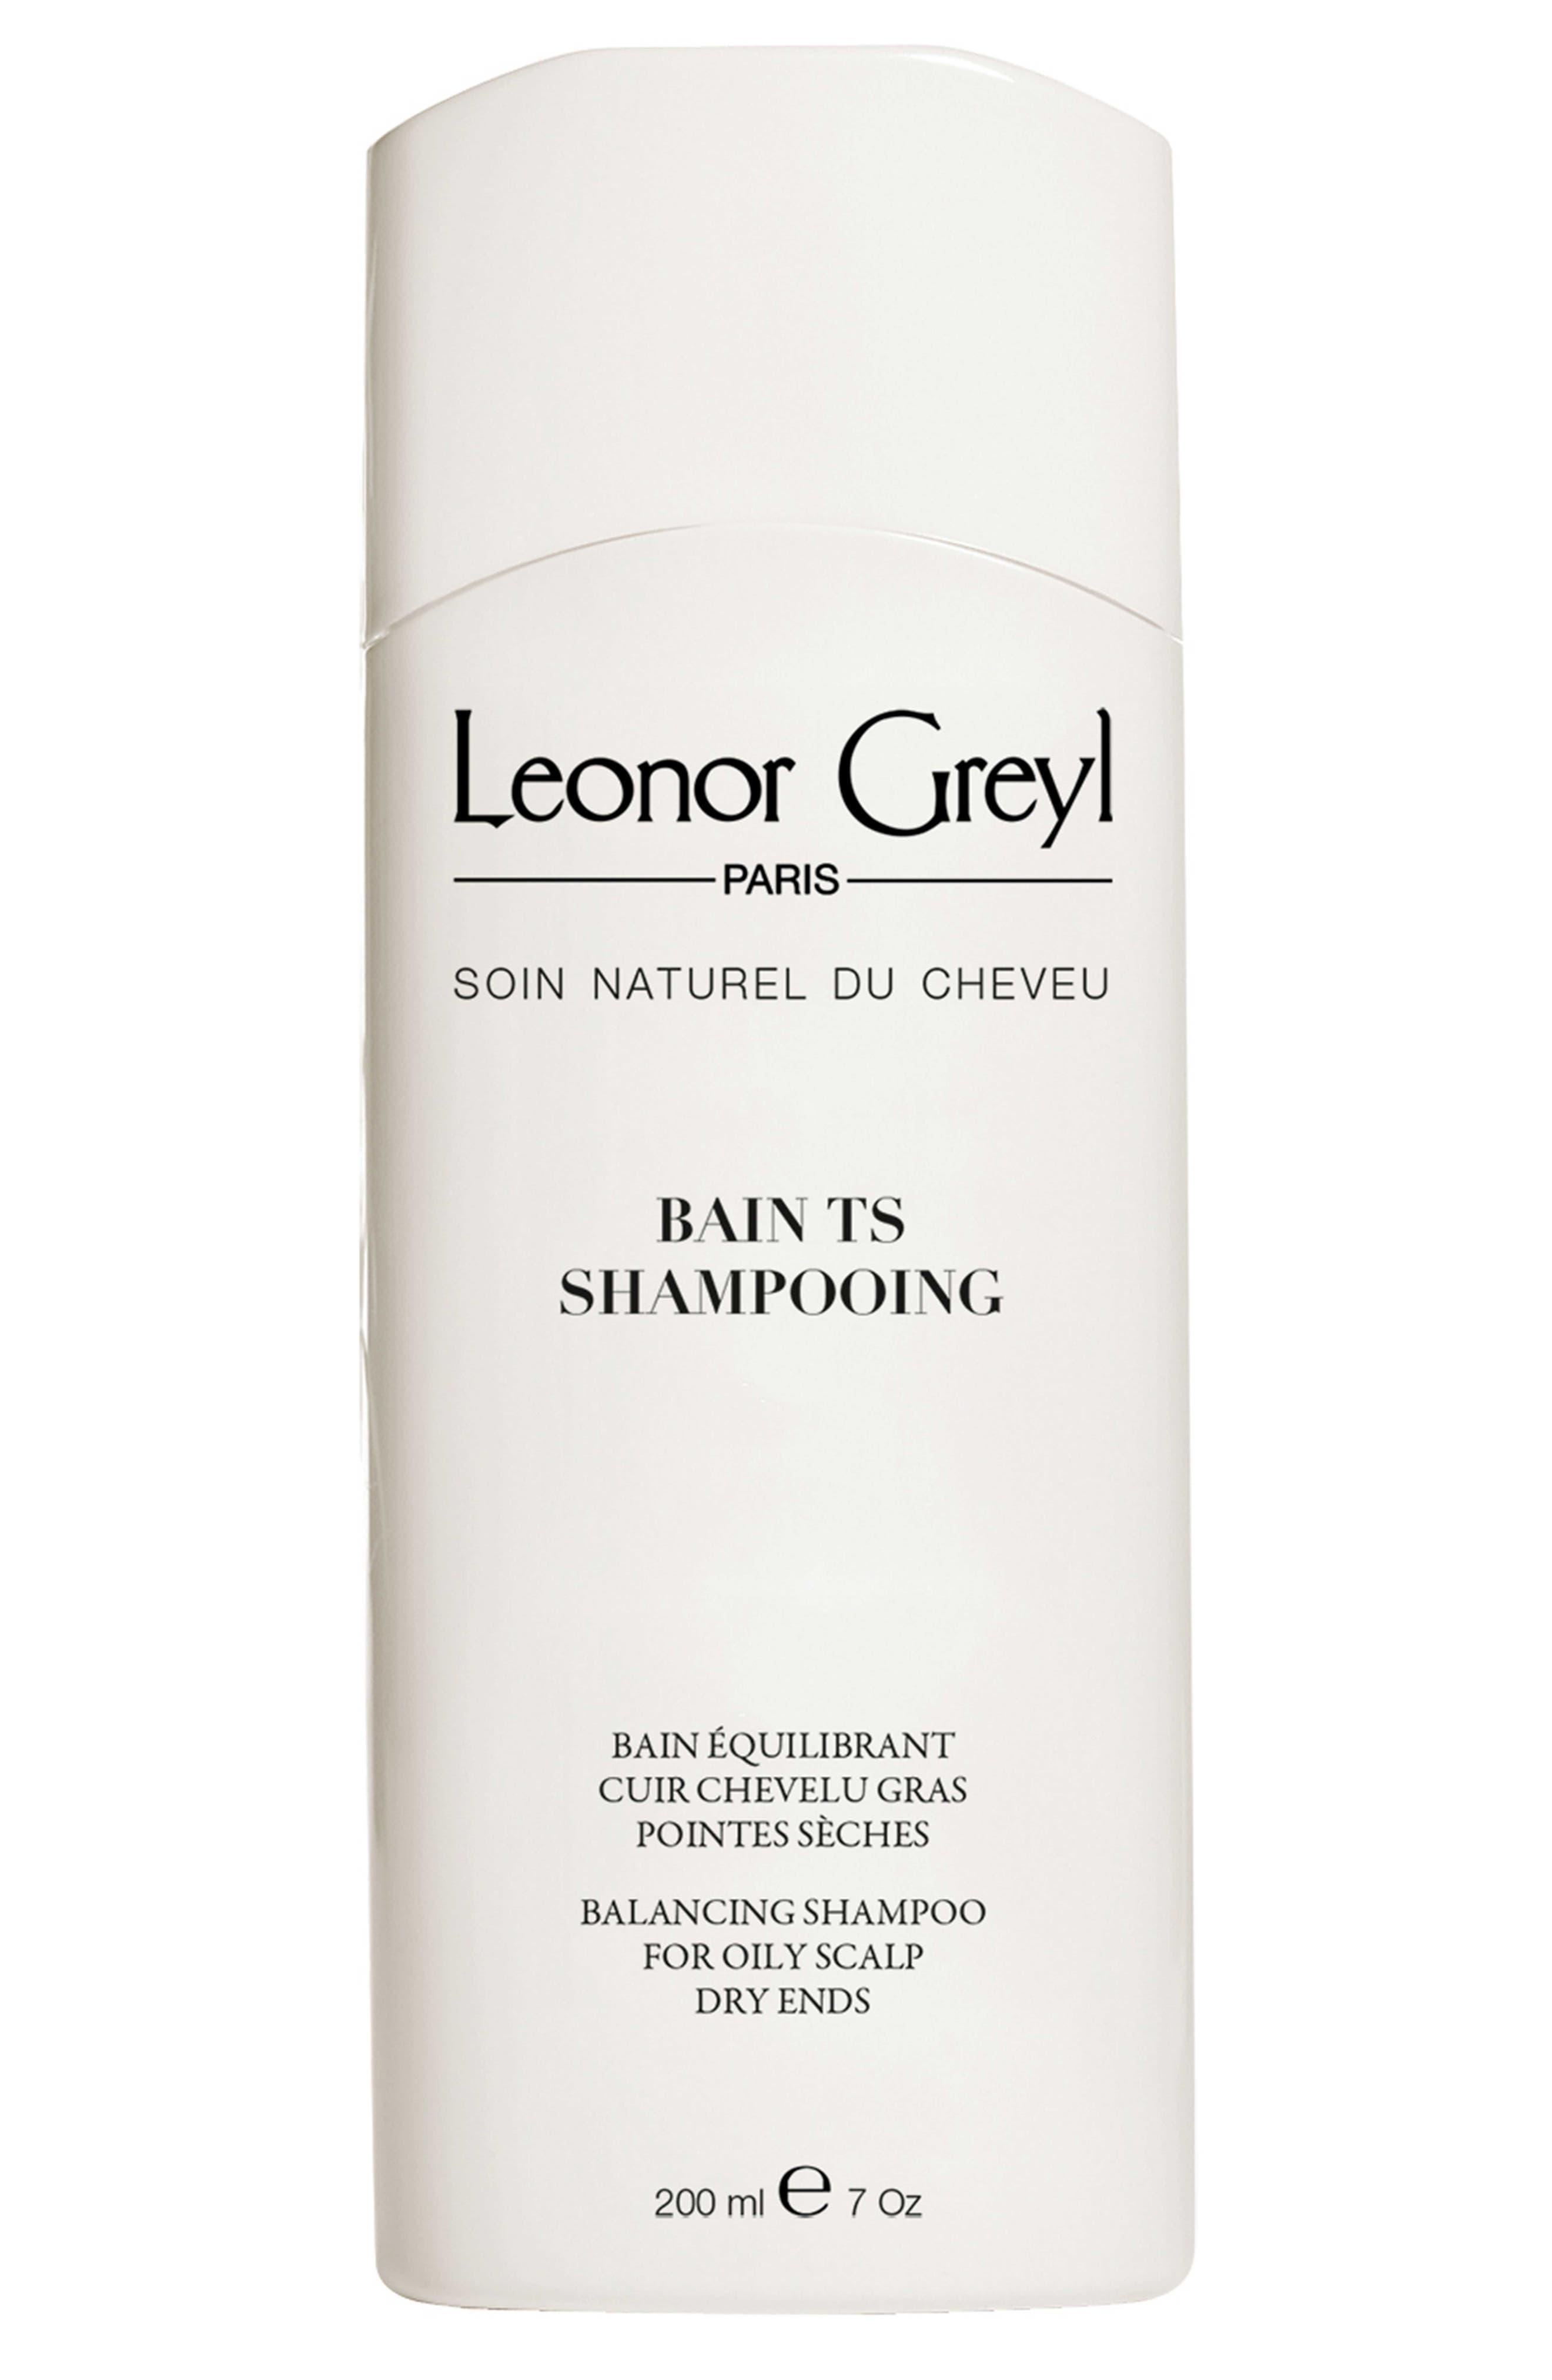 LEONOR GREYL Bain Ts Shampooing (Balancing Shampoo For Oily Scalp And Dry Ends), 7.0 Oz./ 200 Ml